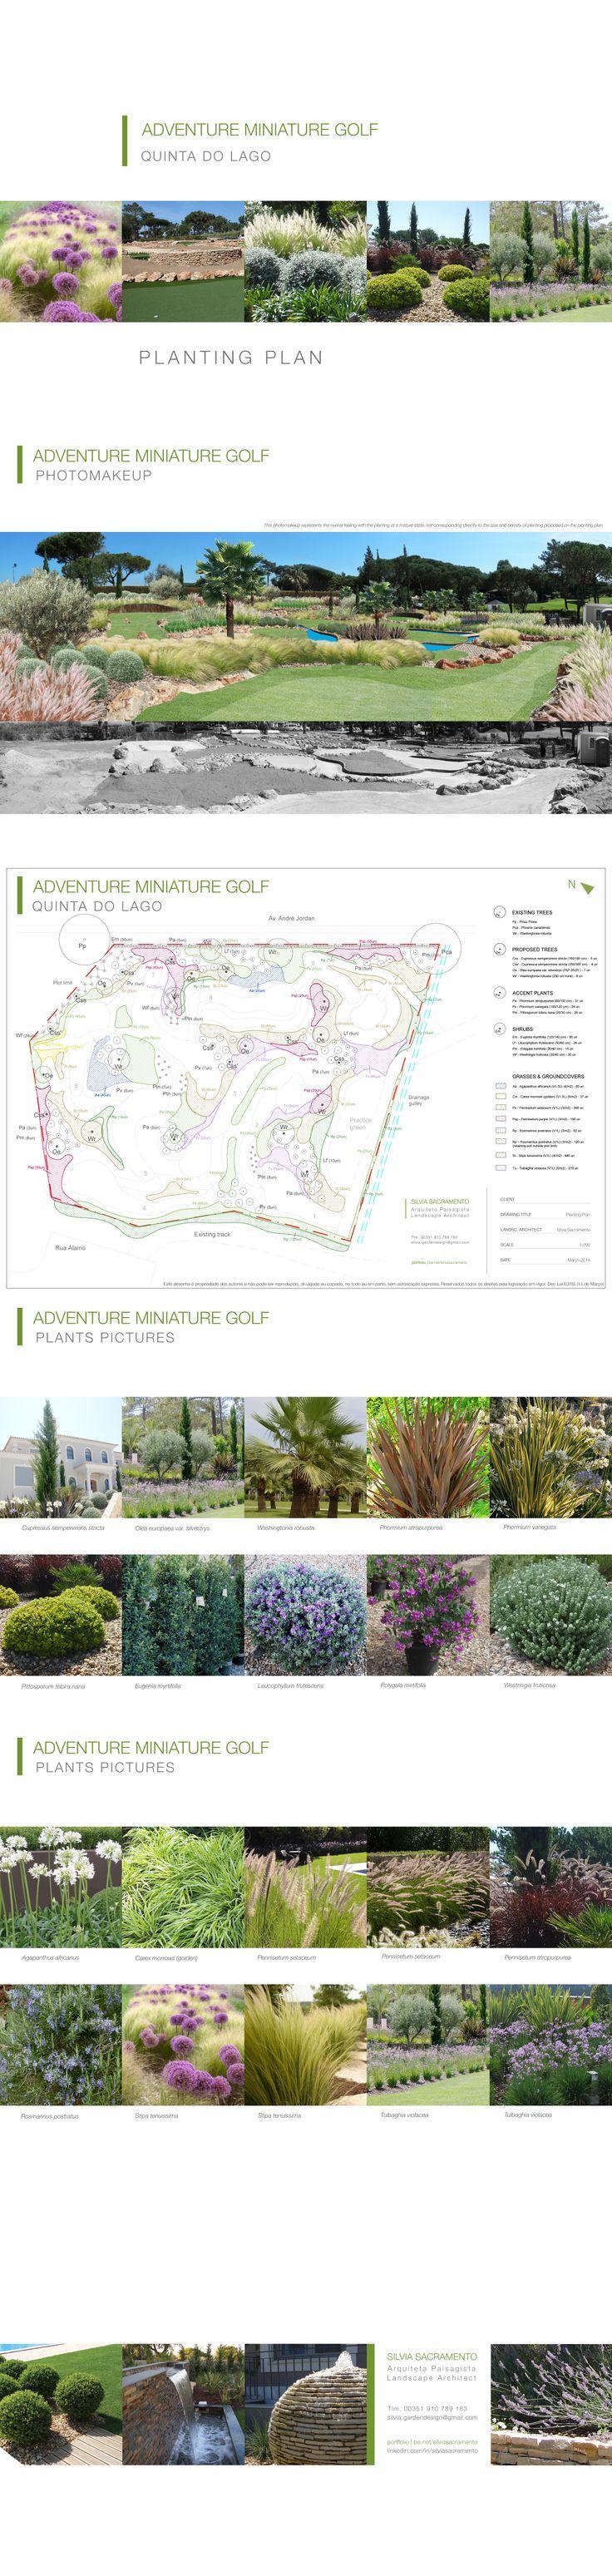 Adventure Mini Golf ::: project presentation Planting Design Project by Silvia Sacramento